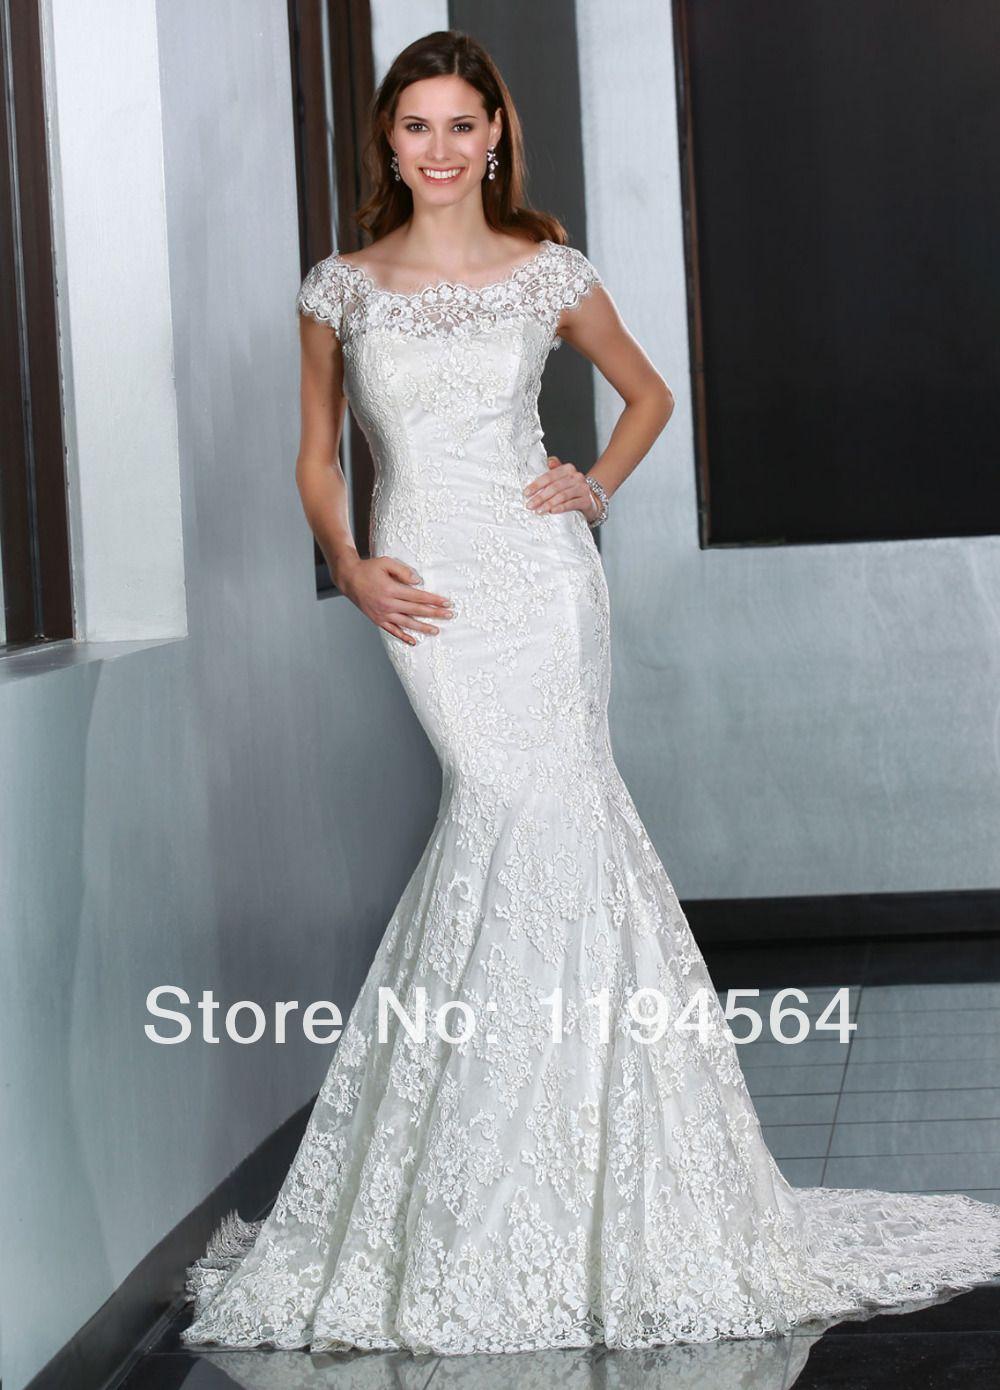 Enchanting Short Bridal Gowns 2014 Photos - All Wedding Dresses ...